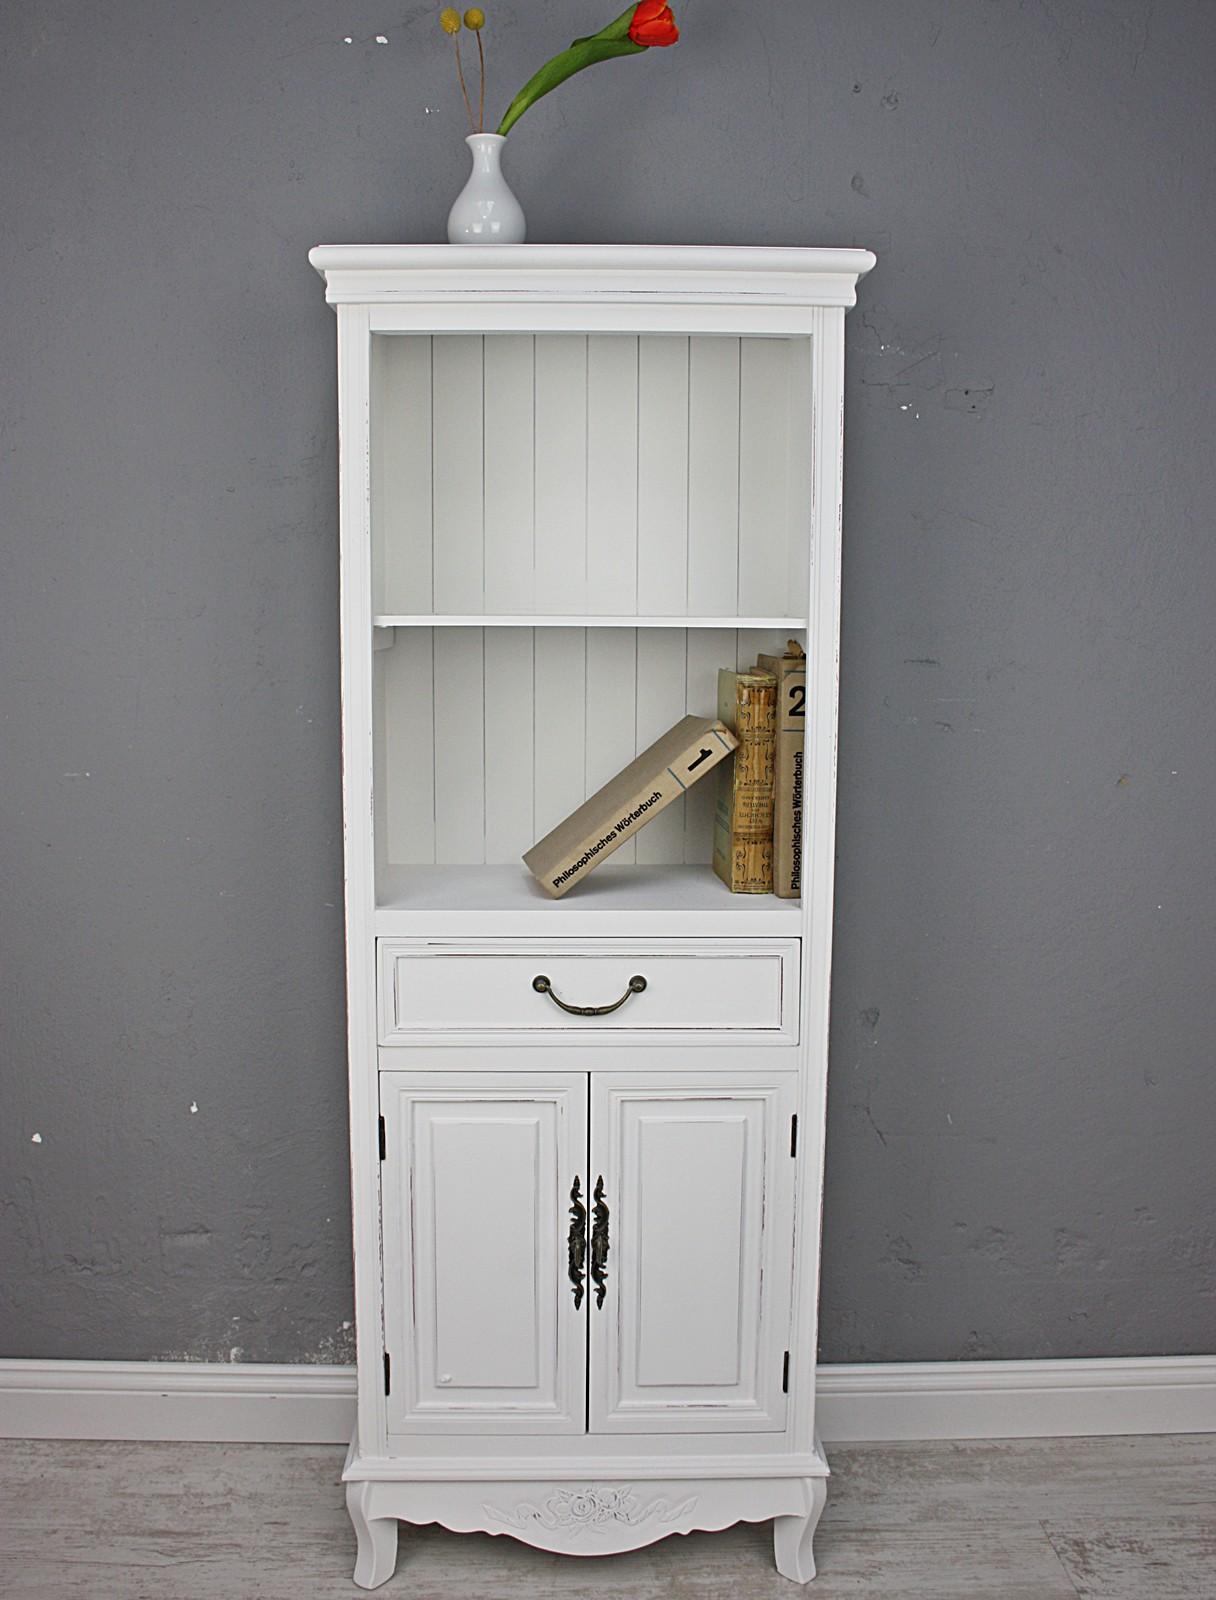 k chenschrank schrank wei antik landhaus holz tellerregal regal k chenregal ebay. Black Bedroom Furniture Sets. Home Design Ideas